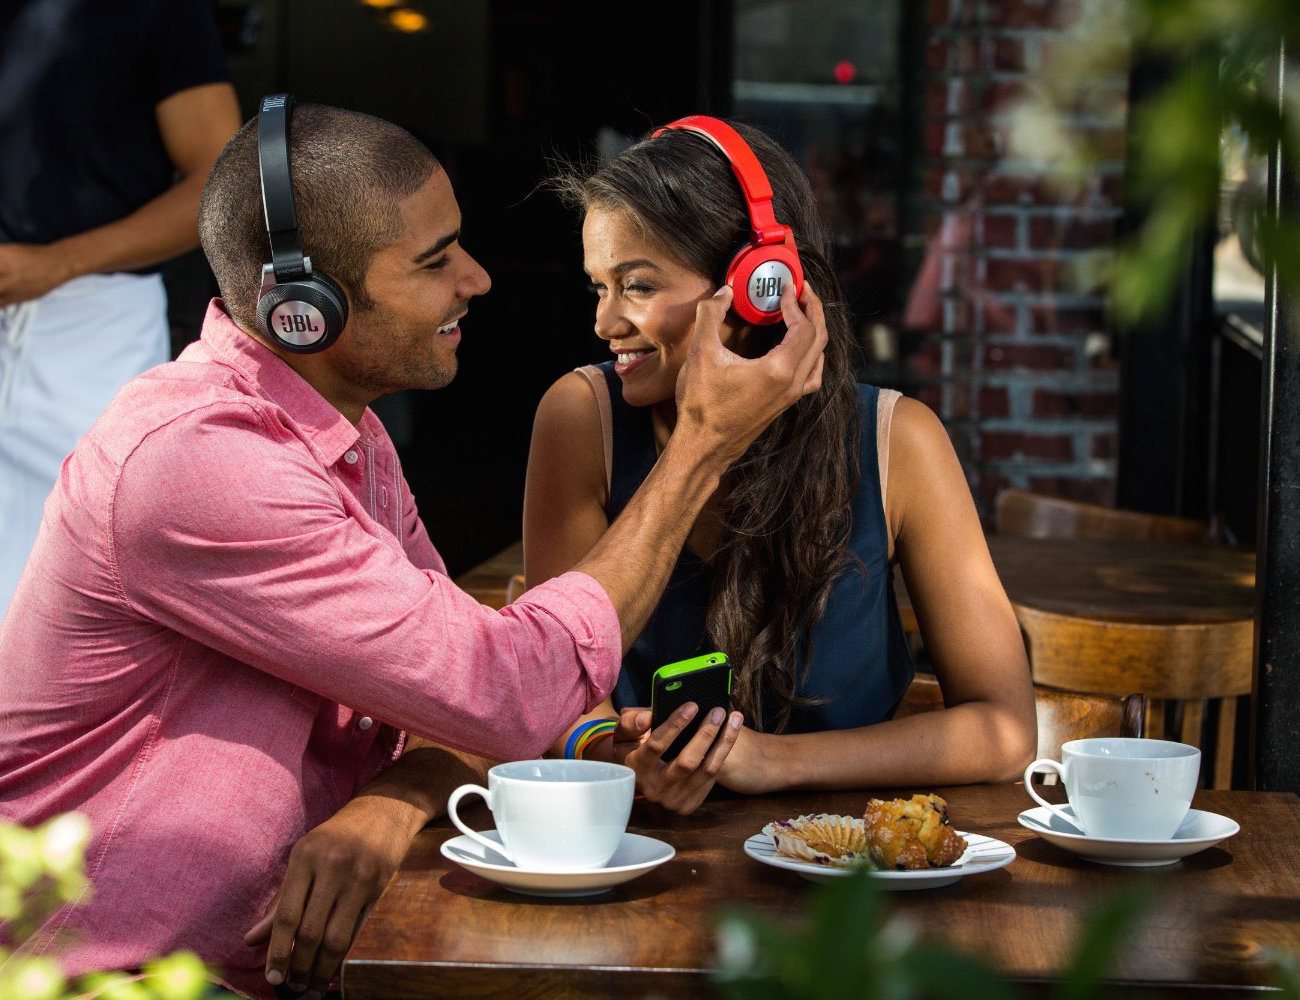 JBL Synchros E40BT On-Ear Bluetooth Headphones